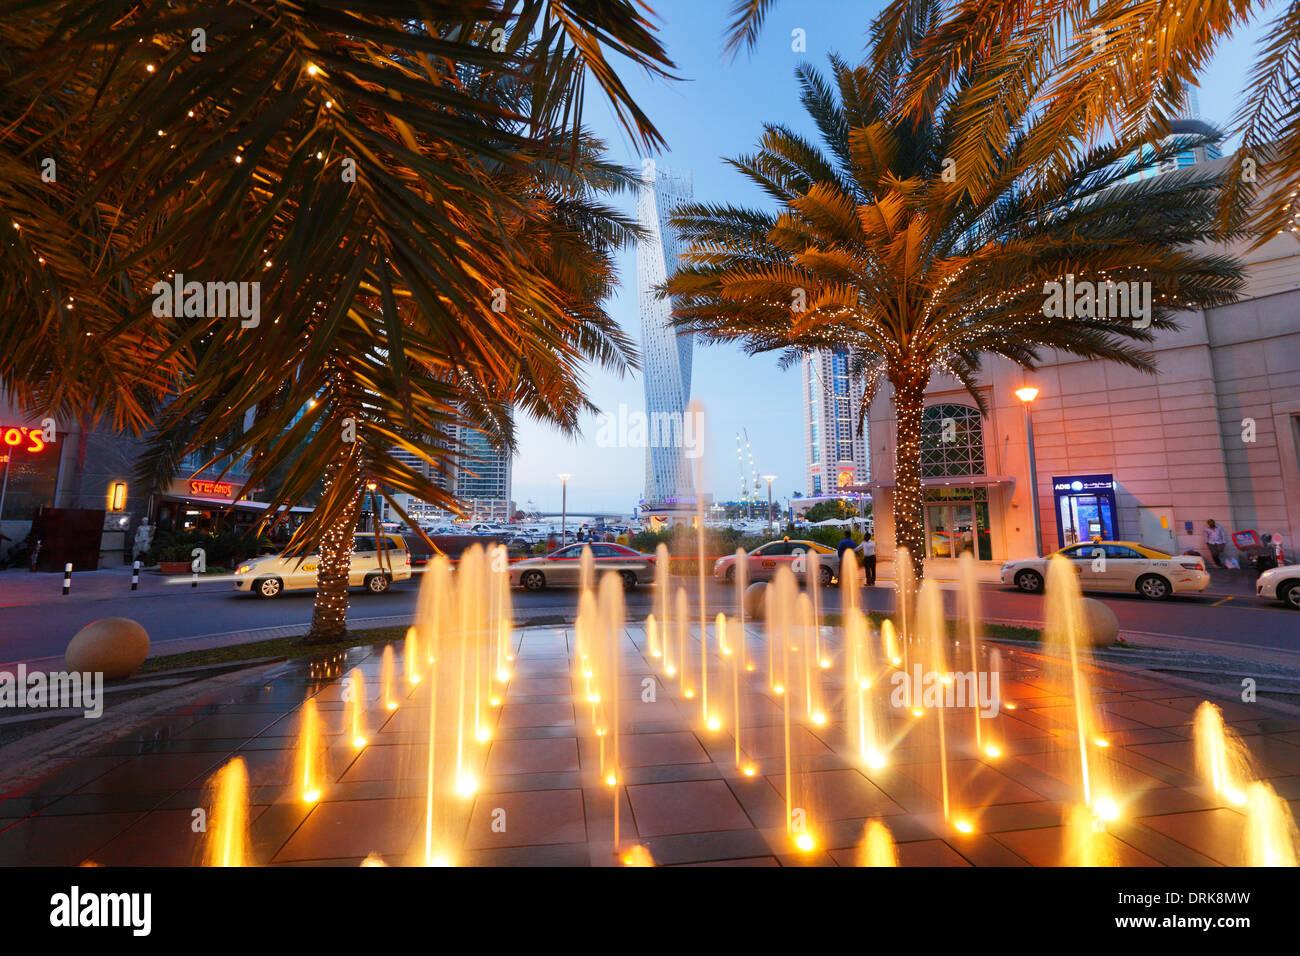 Dubai Marina, fountain - Stock Image